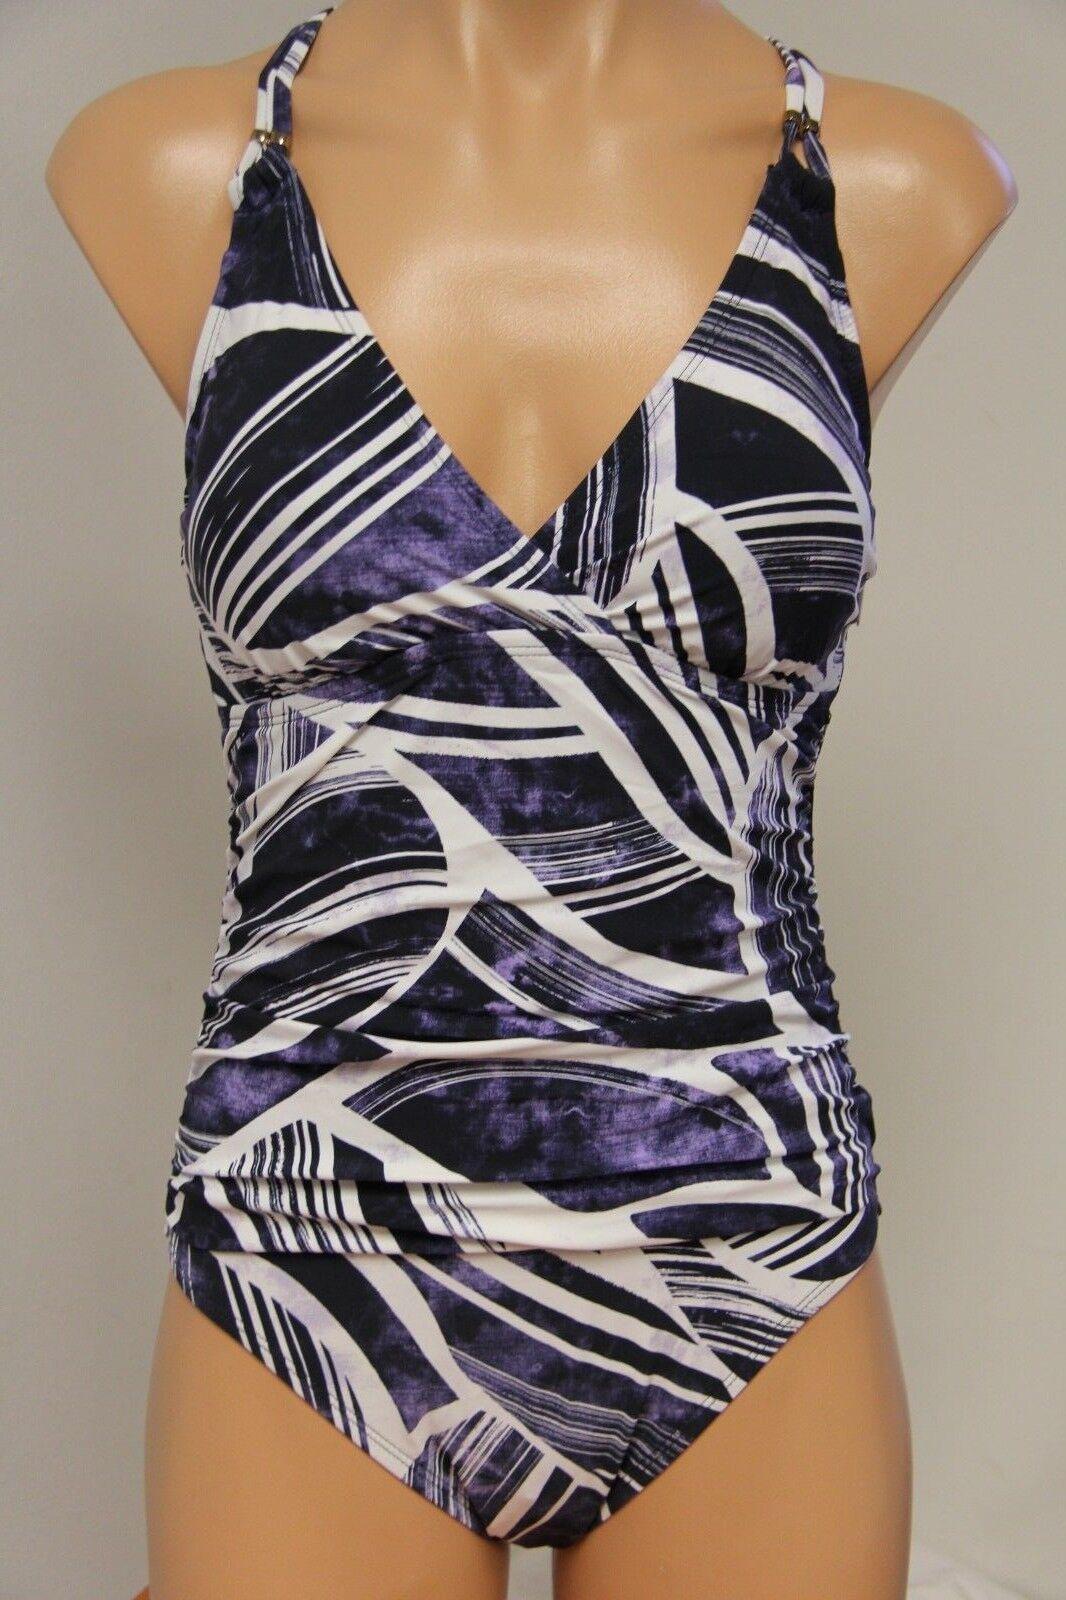 NWT La whitea Swimsuit Bikini 1 1 1 one piece Sz 12 Midnight MID 740b42